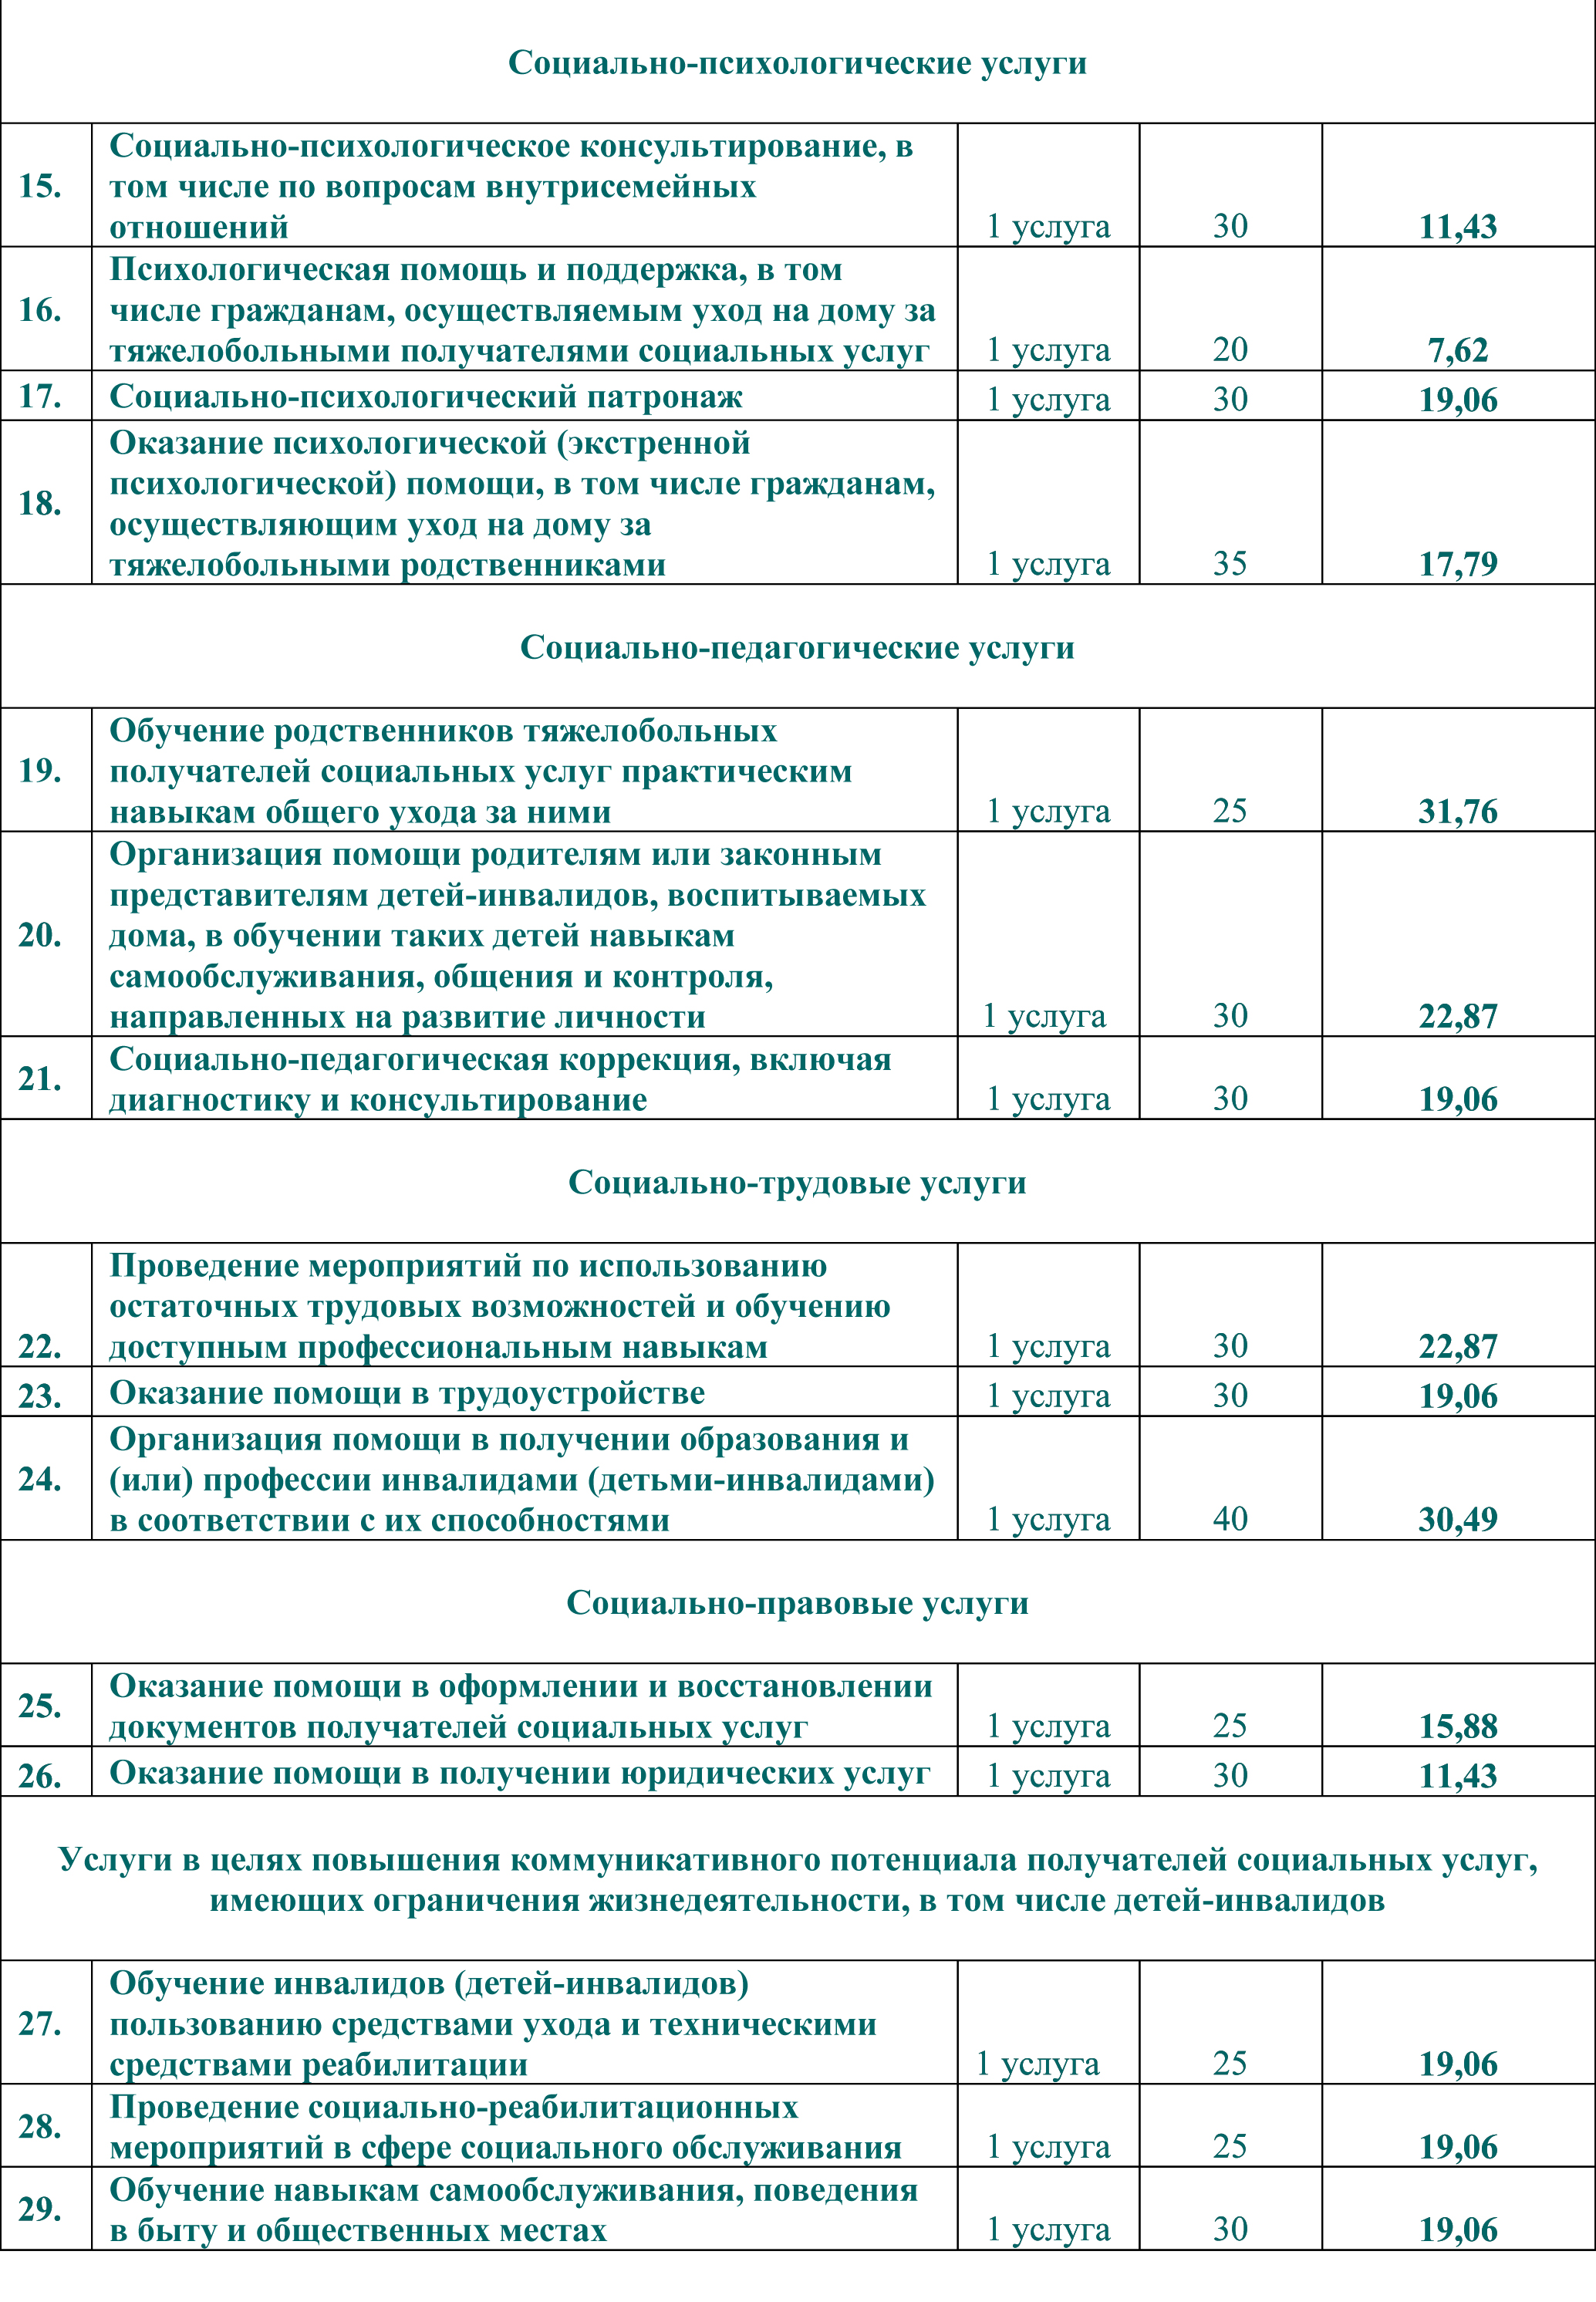 tarif-oso-csonekl-2019-2